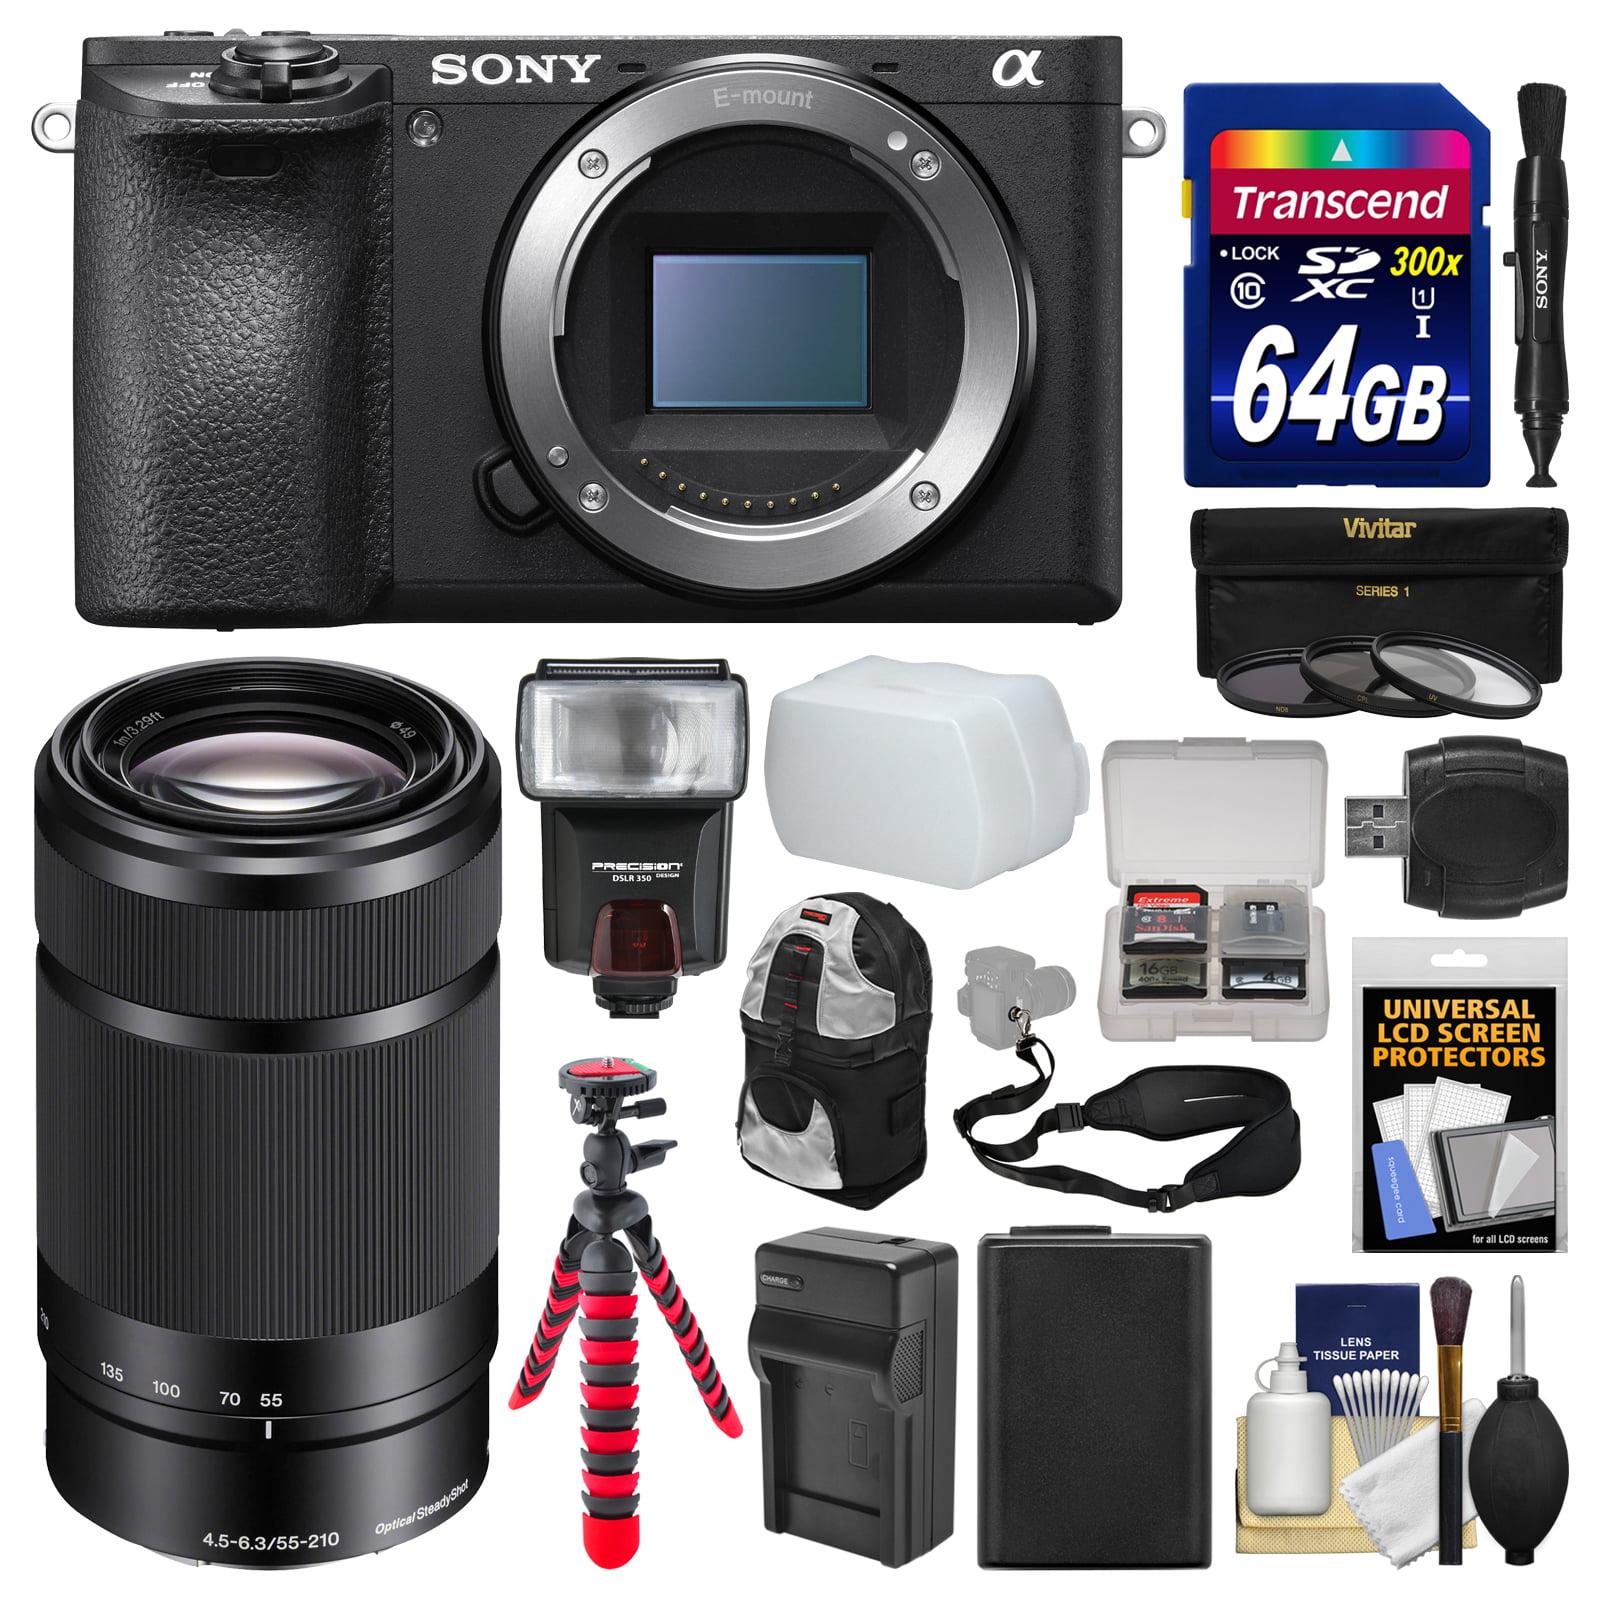 Sony Alpha A6500 4K Wi-Fi Digital Camera Body with 55-210mm Lens + 64GB Card + Backpack + Flash + Battery &... by Sony